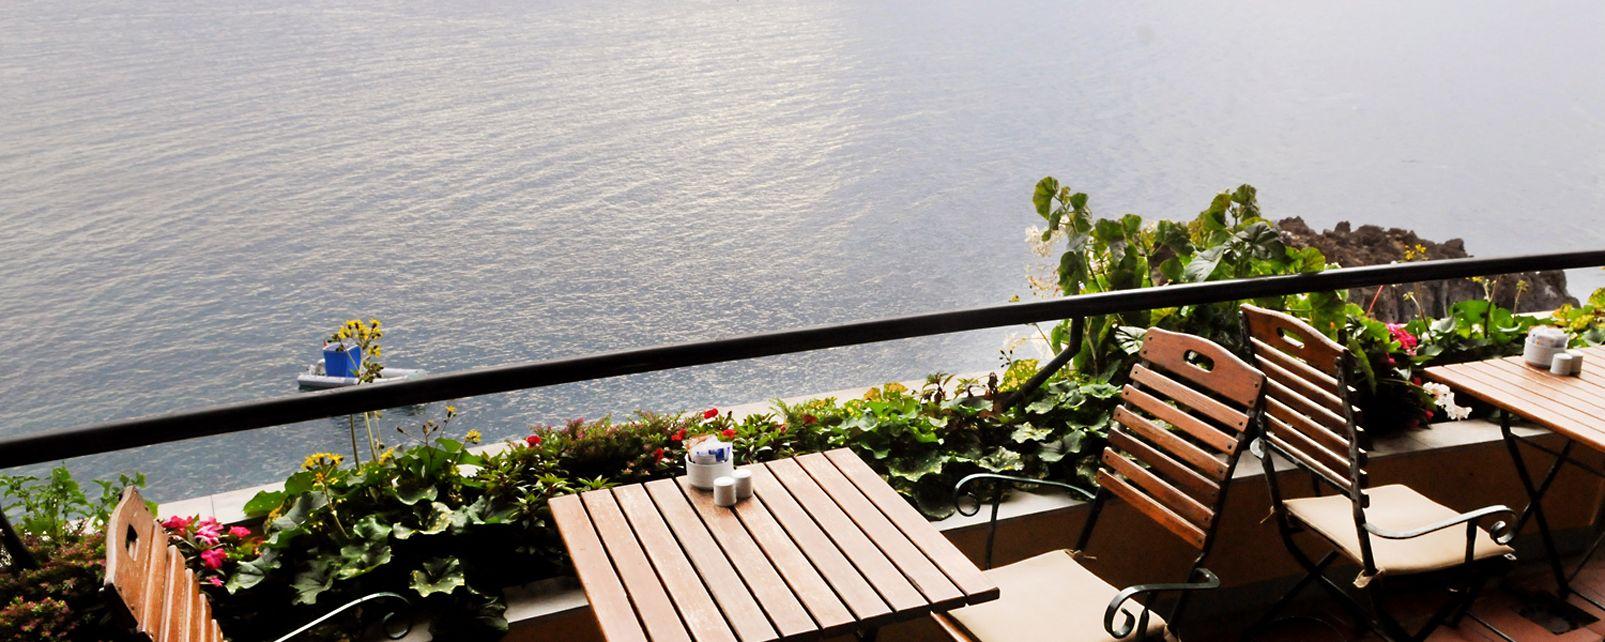 Hôtel Pestana Palms Ocean Hotel